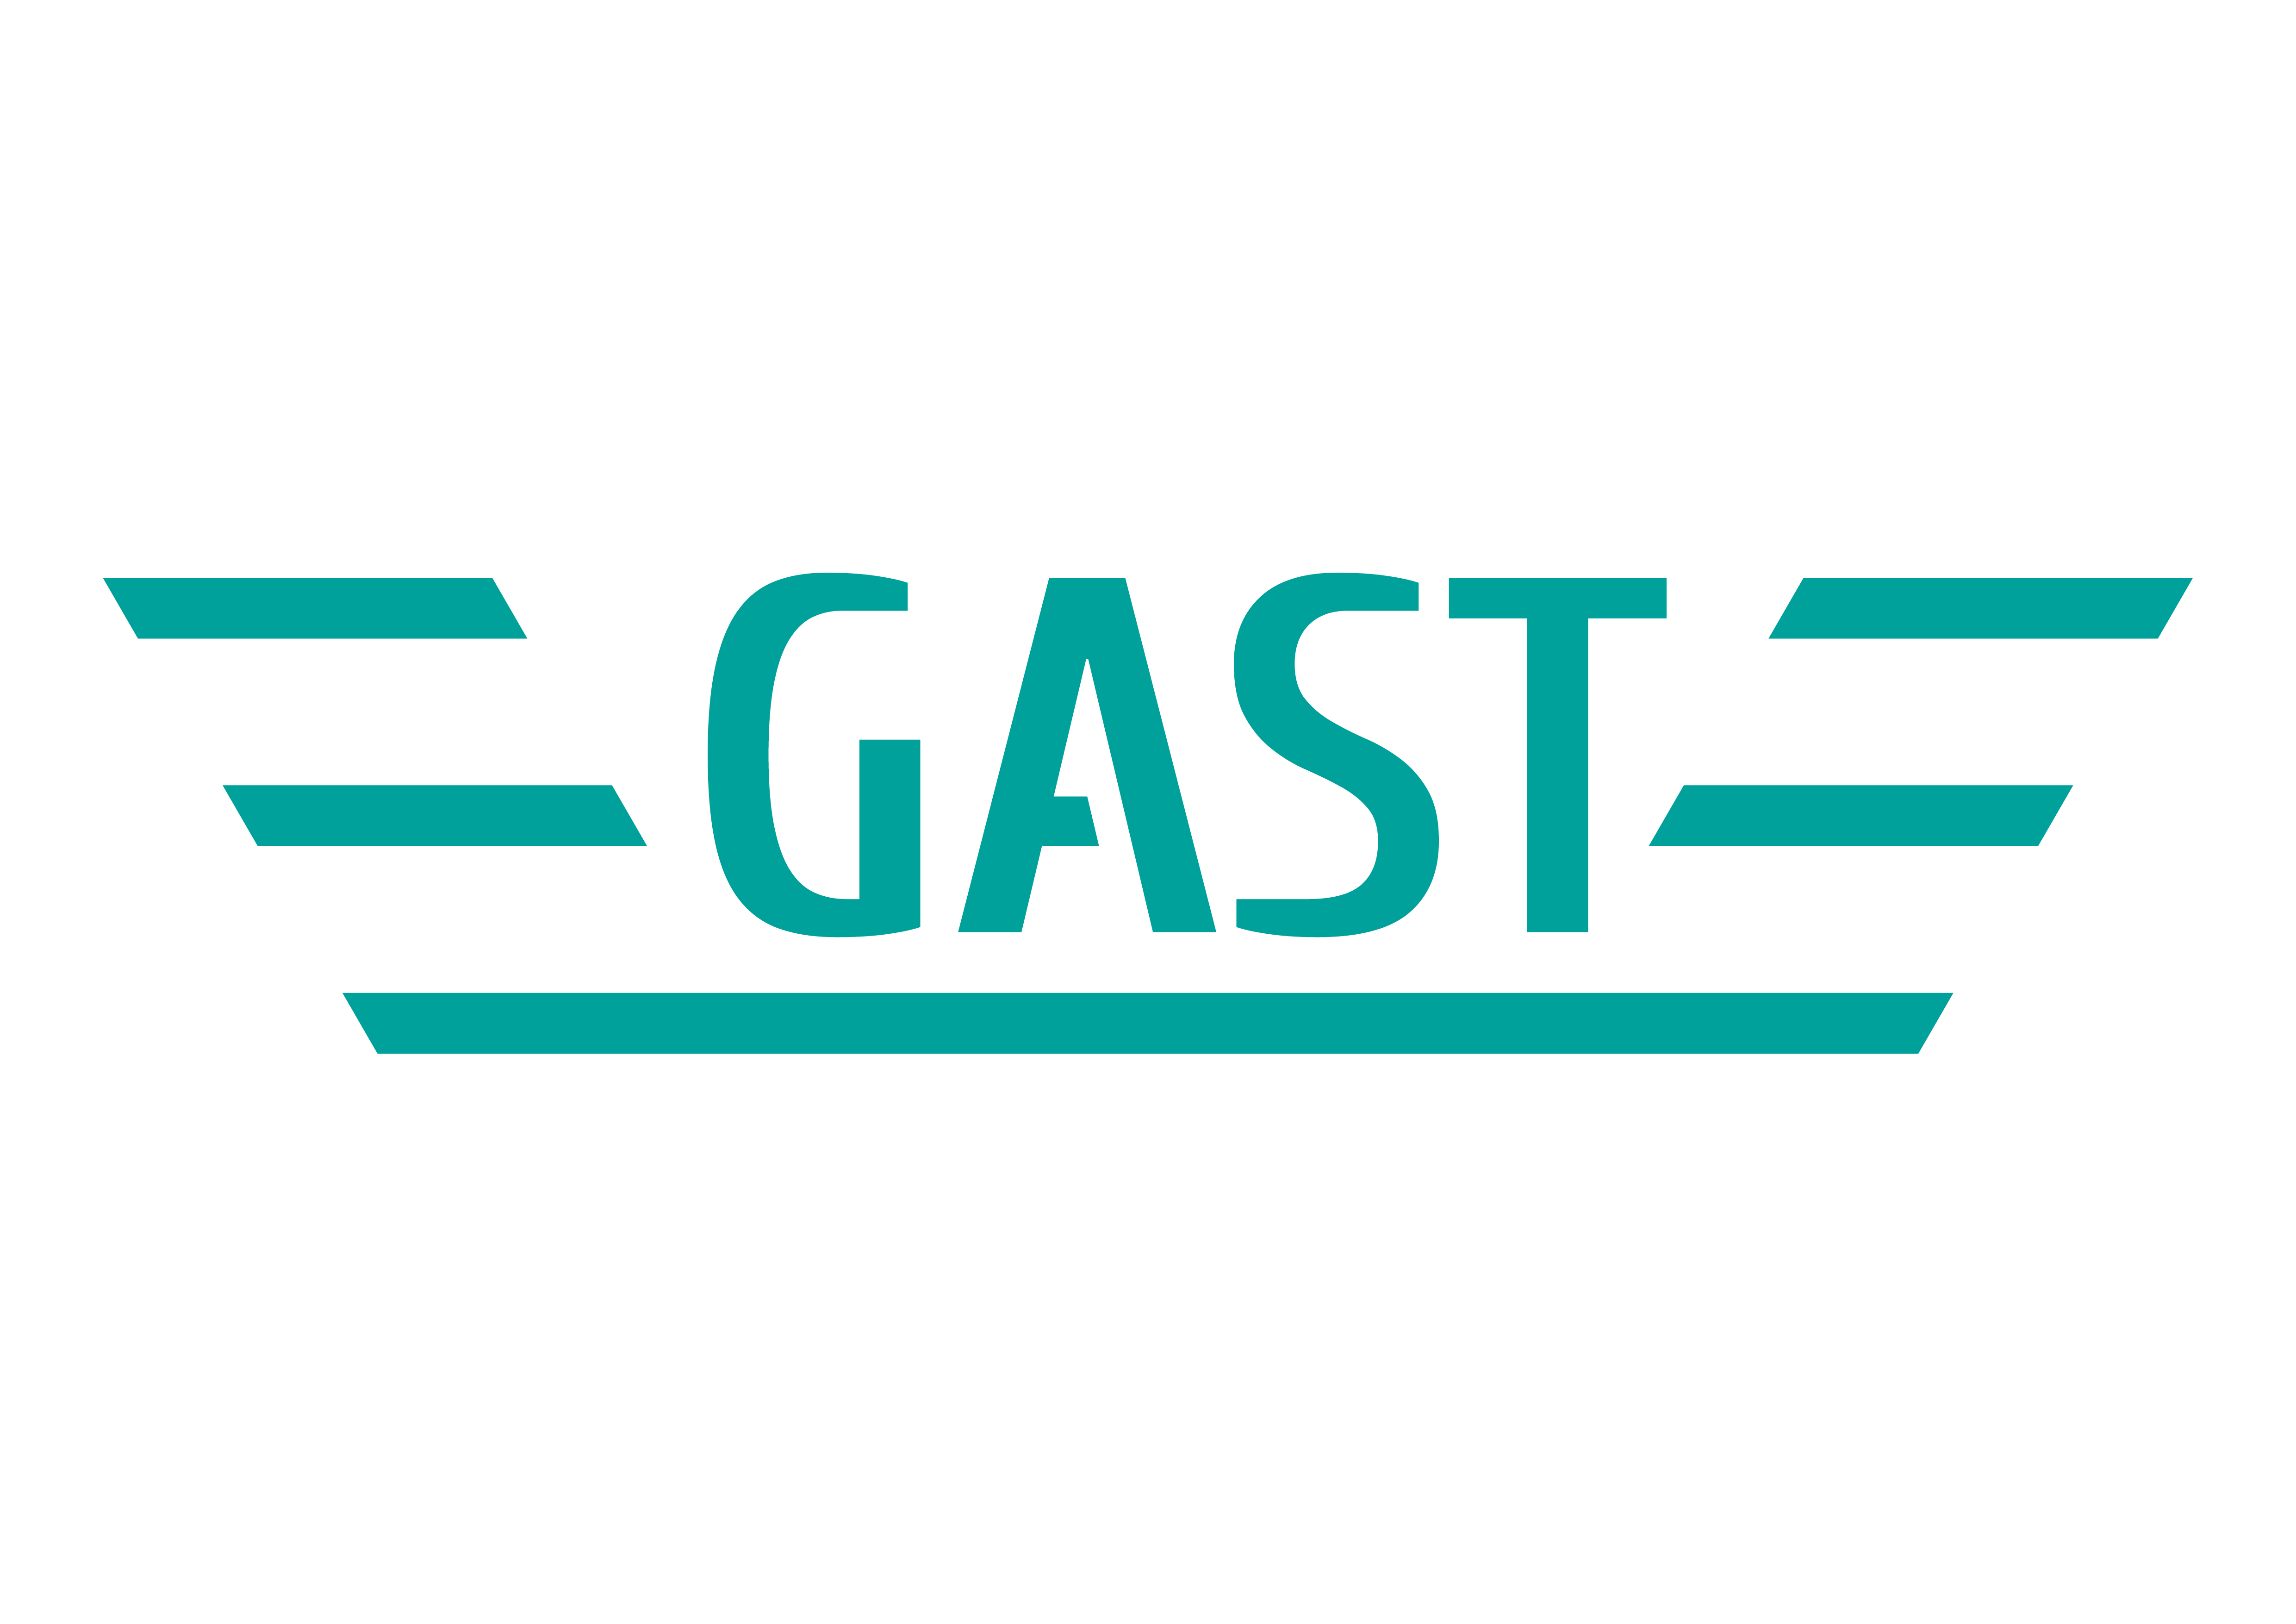 GastWaldis